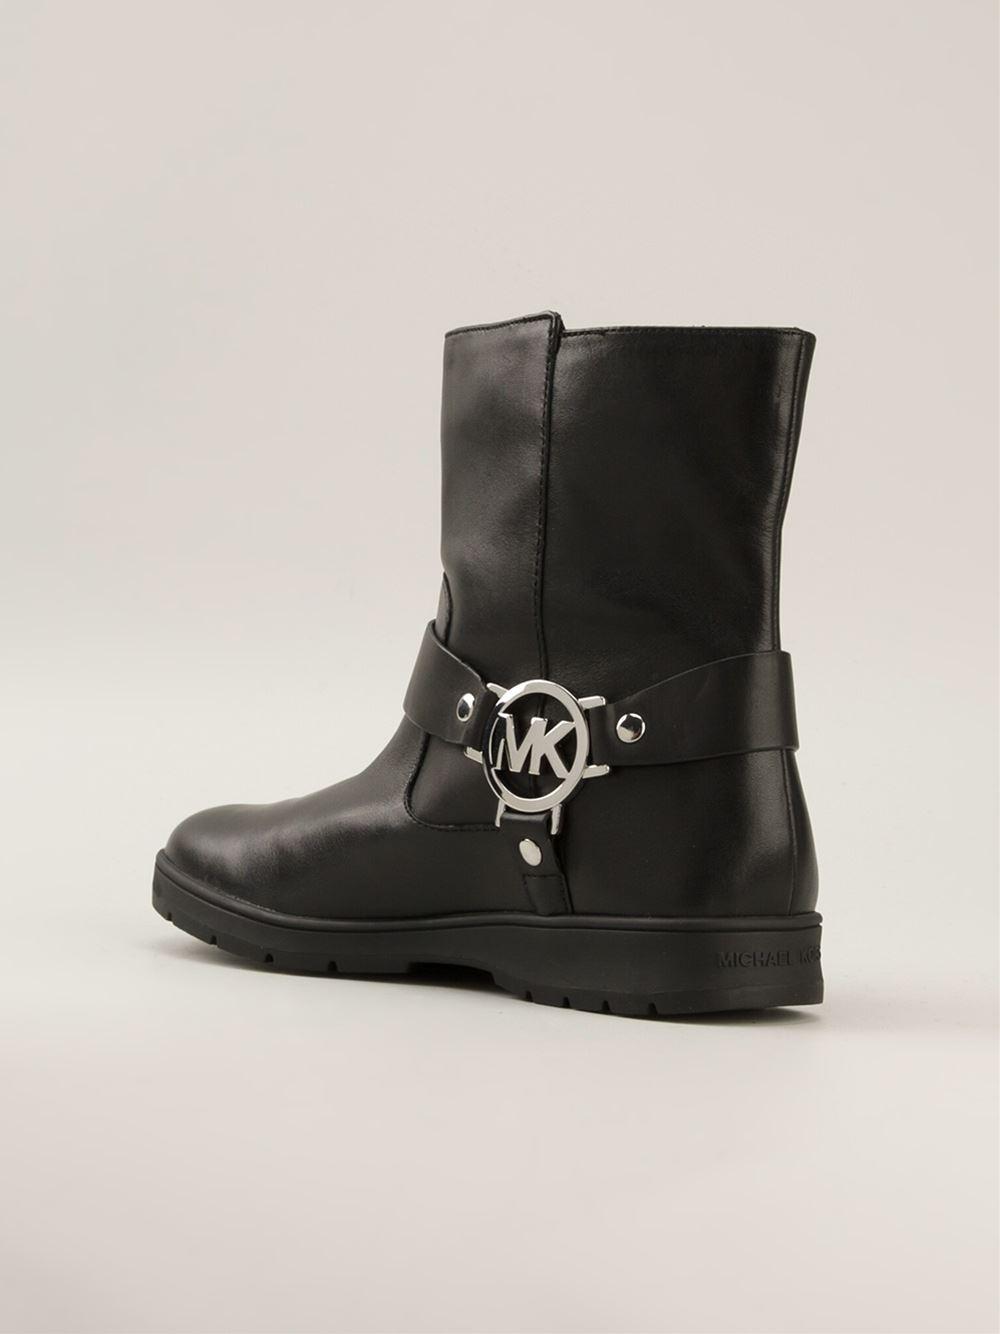 Michael Kors 'Fulton' Biker Boots in Black